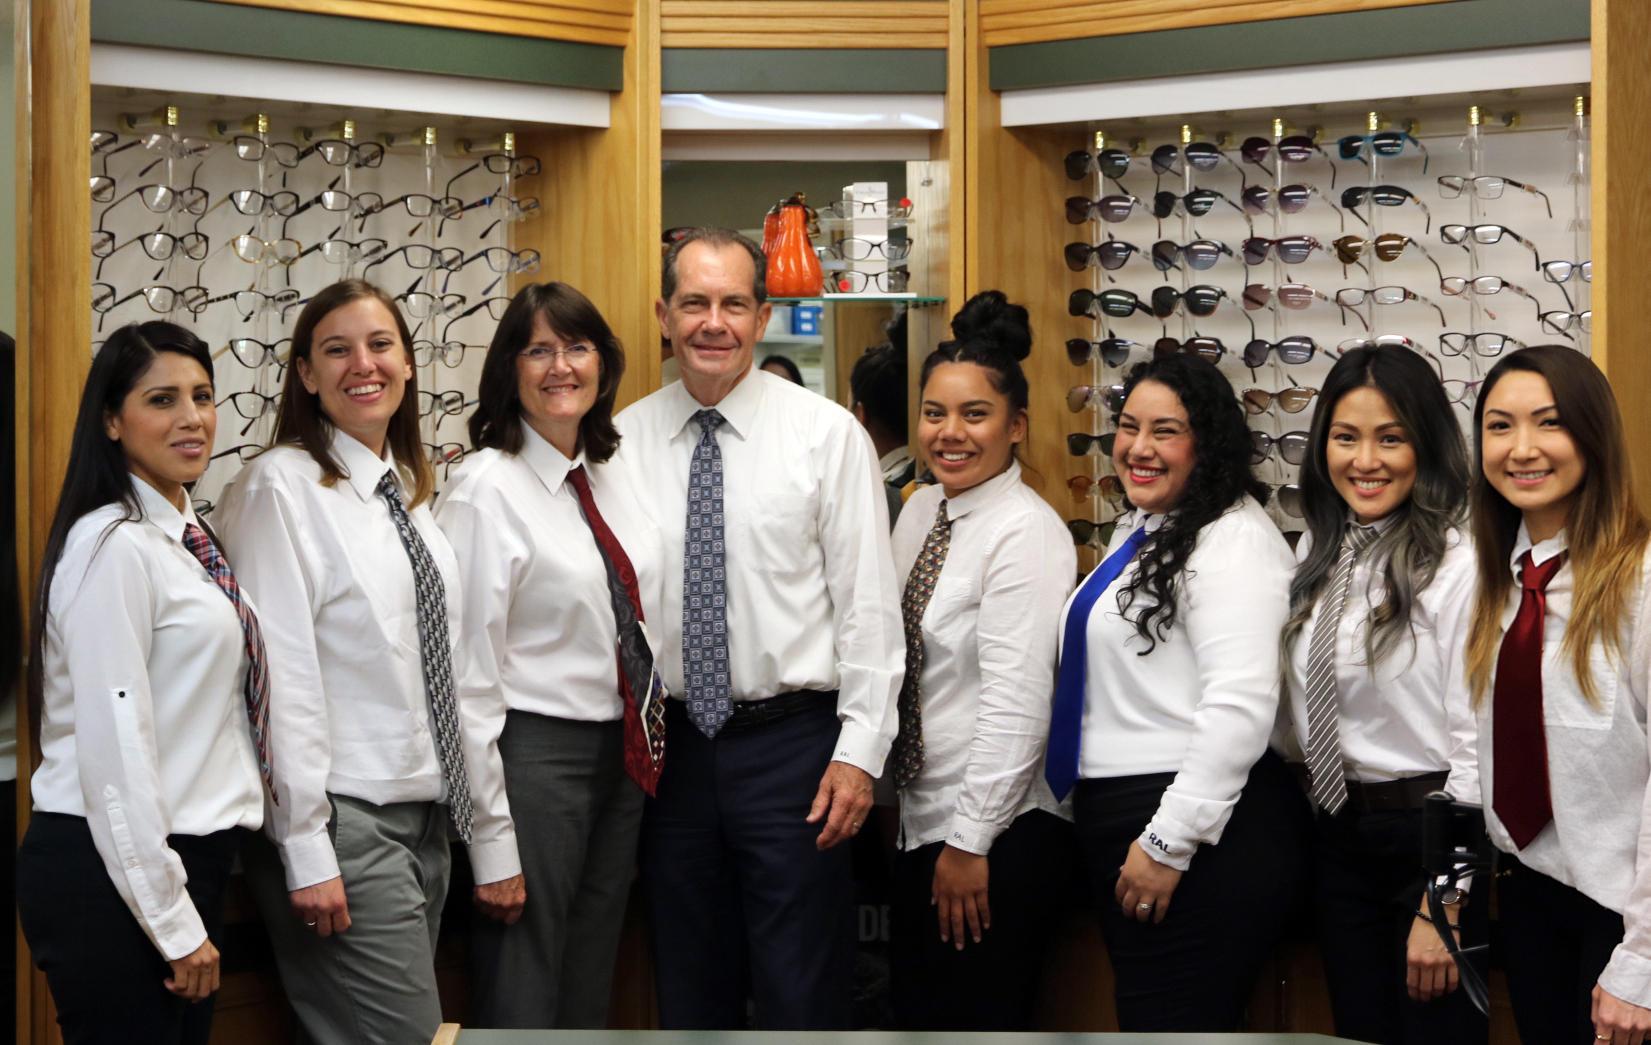 LaFont Family Eyecare Optometry image 7